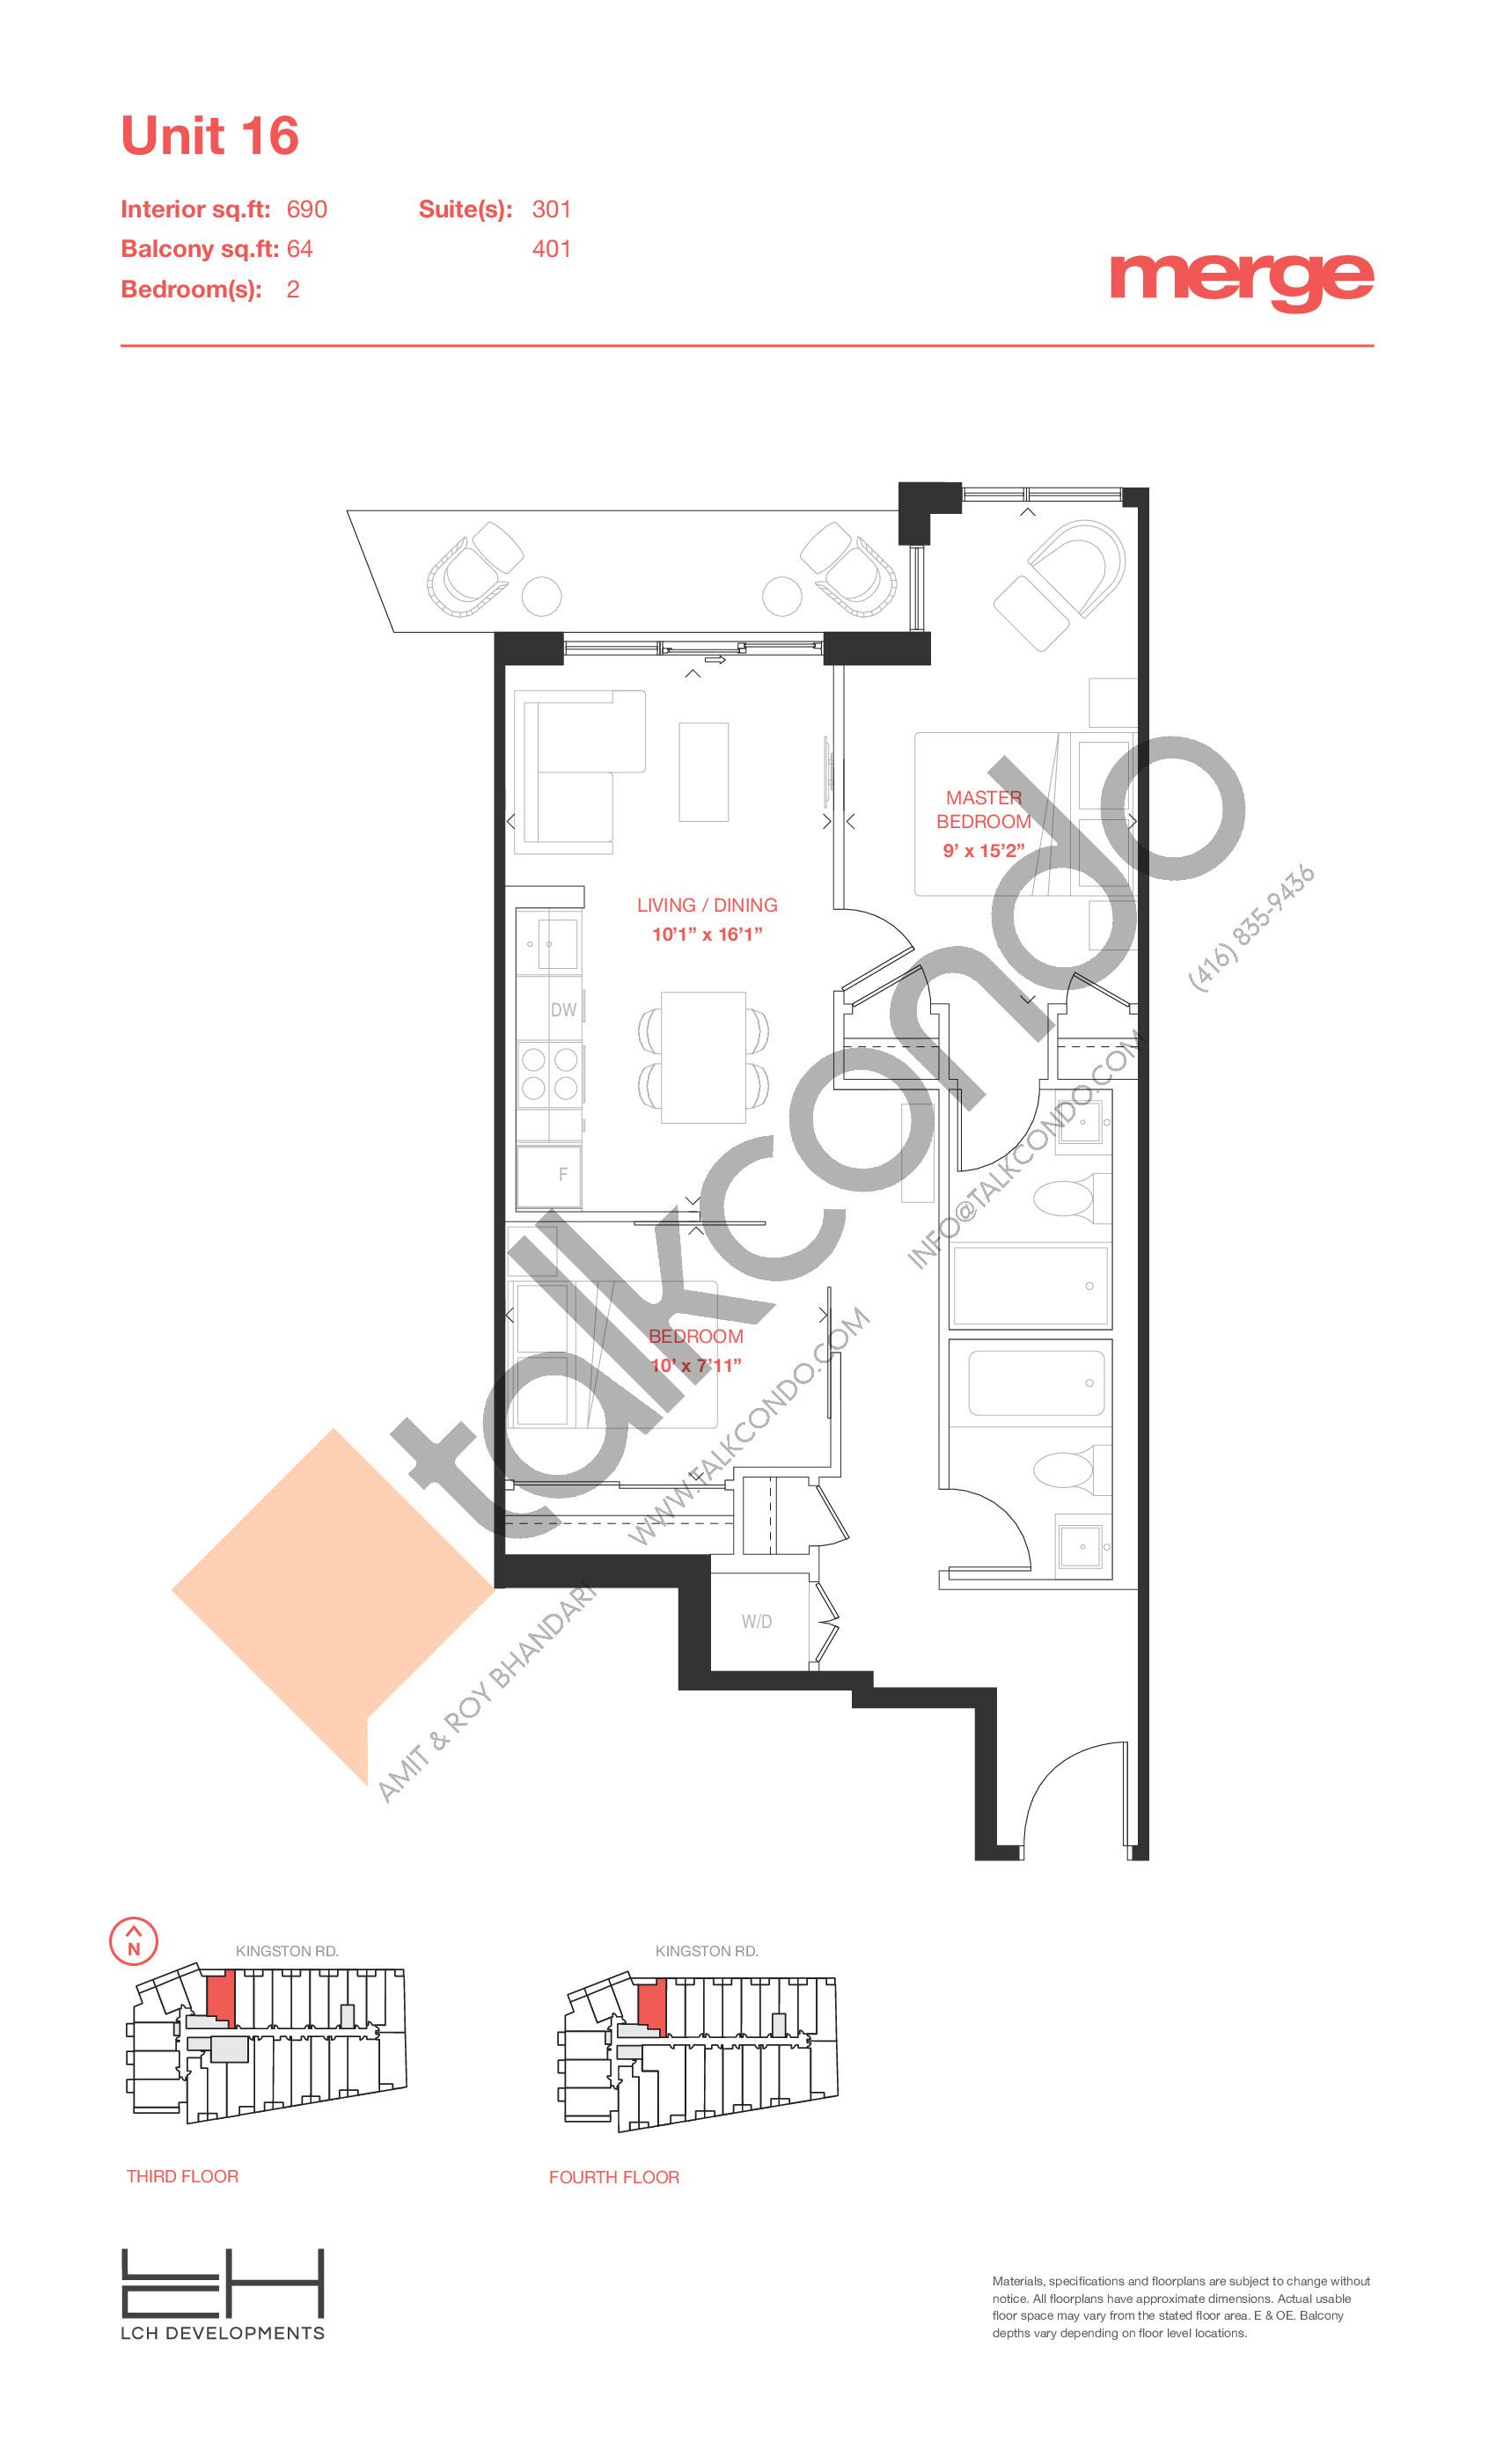 Unit 16 - Tower Floor Plan at Merge Condos - 690 sq.ft